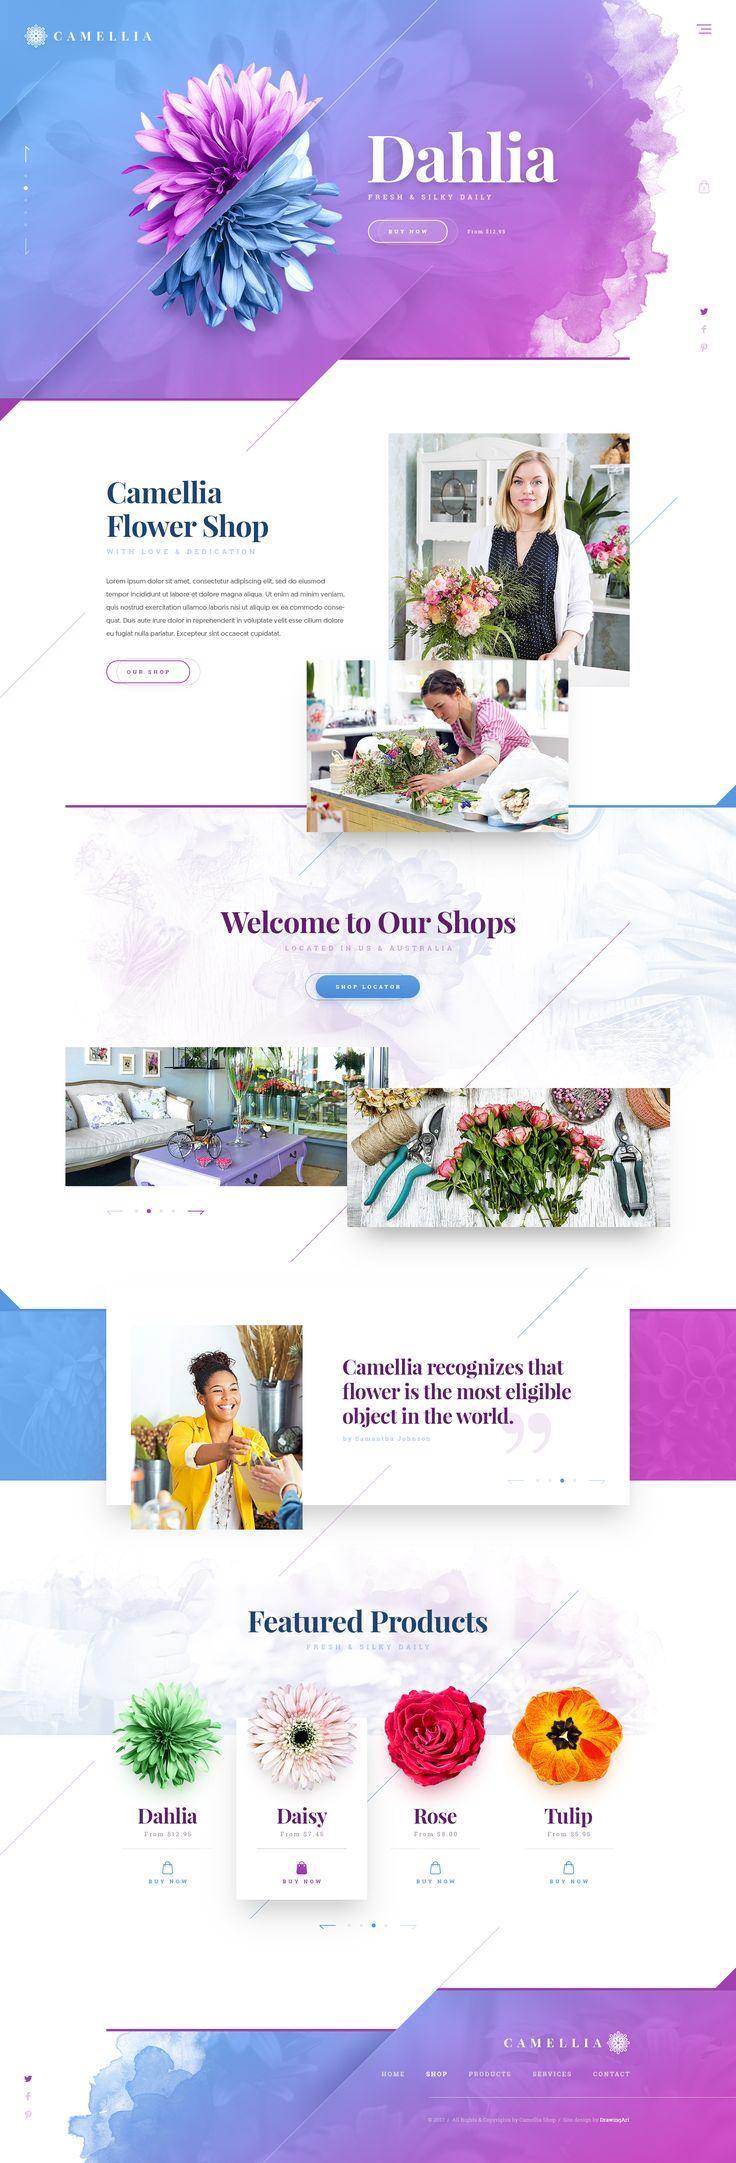 Camellia Flower Shop https://dribbble.com/shots/3496380-Camellia  #drawingart #camellia #dribbble #website #web #design #webdesign #shop #ecommerce #ui #ux #responsive #flower #florist #studio